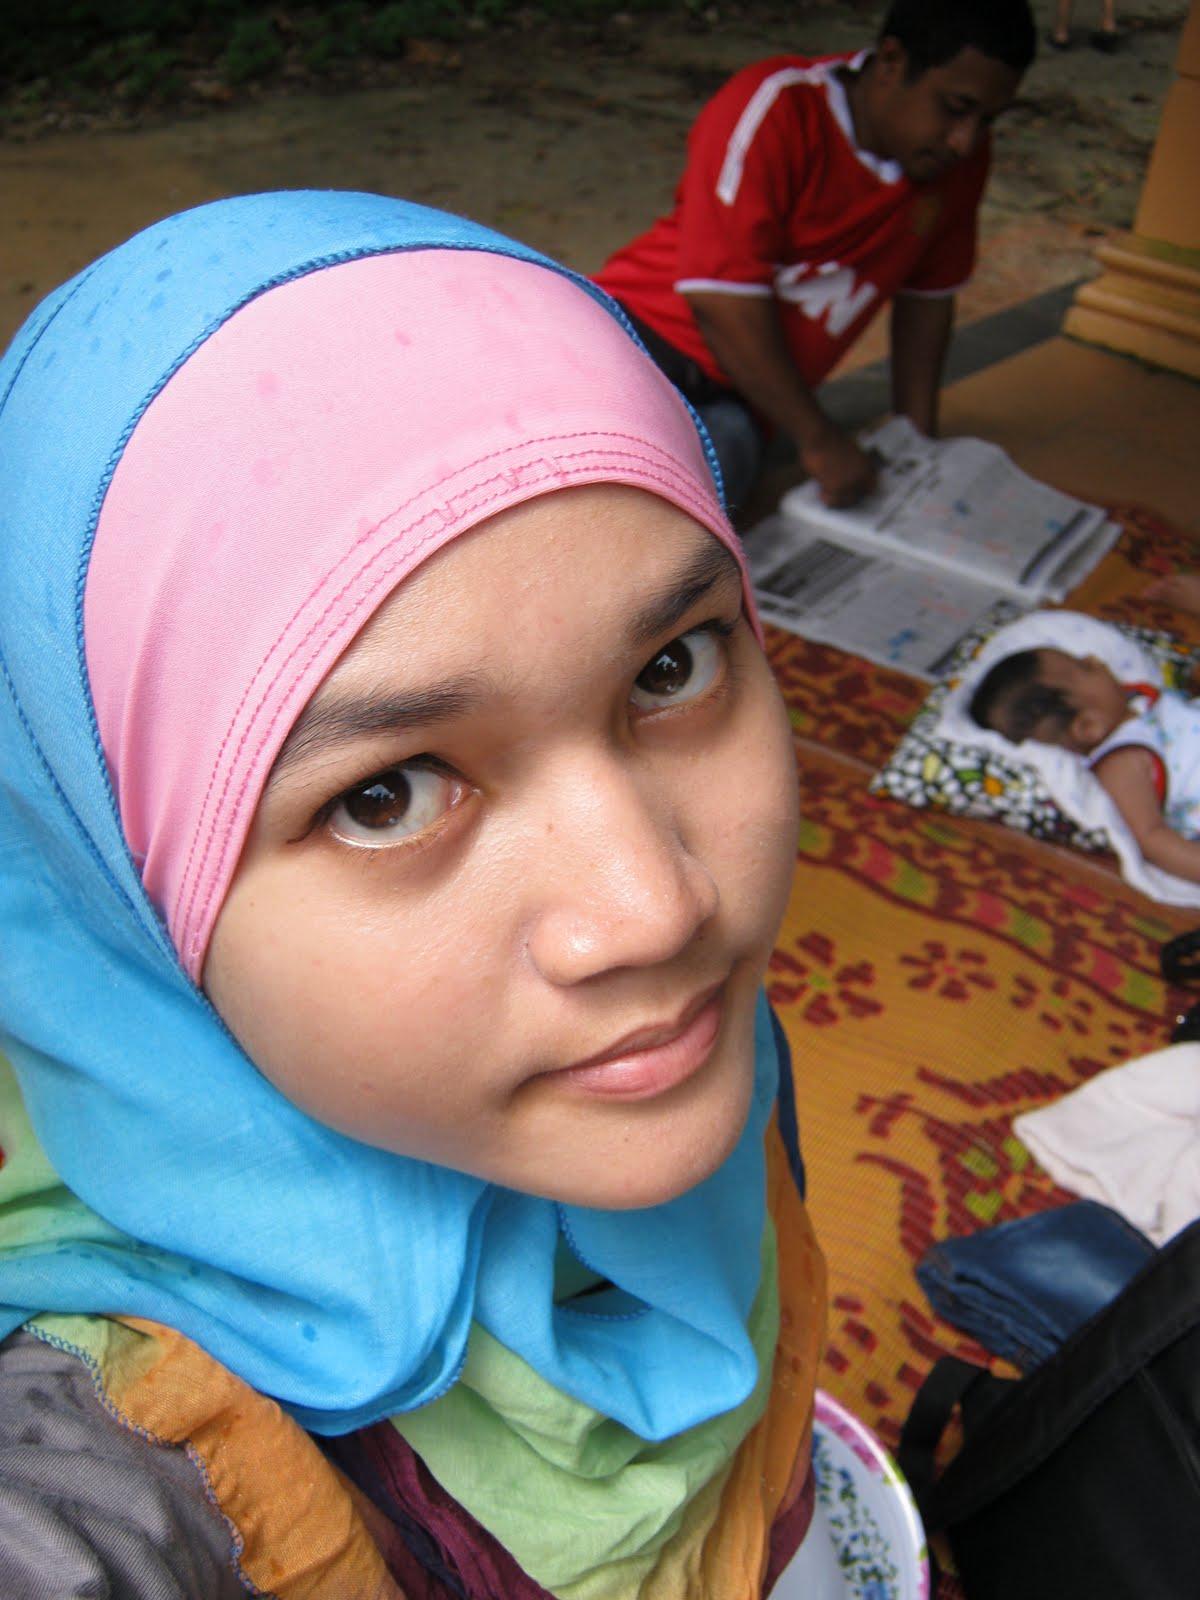 Garnier moisturizer for oily skin malaysia